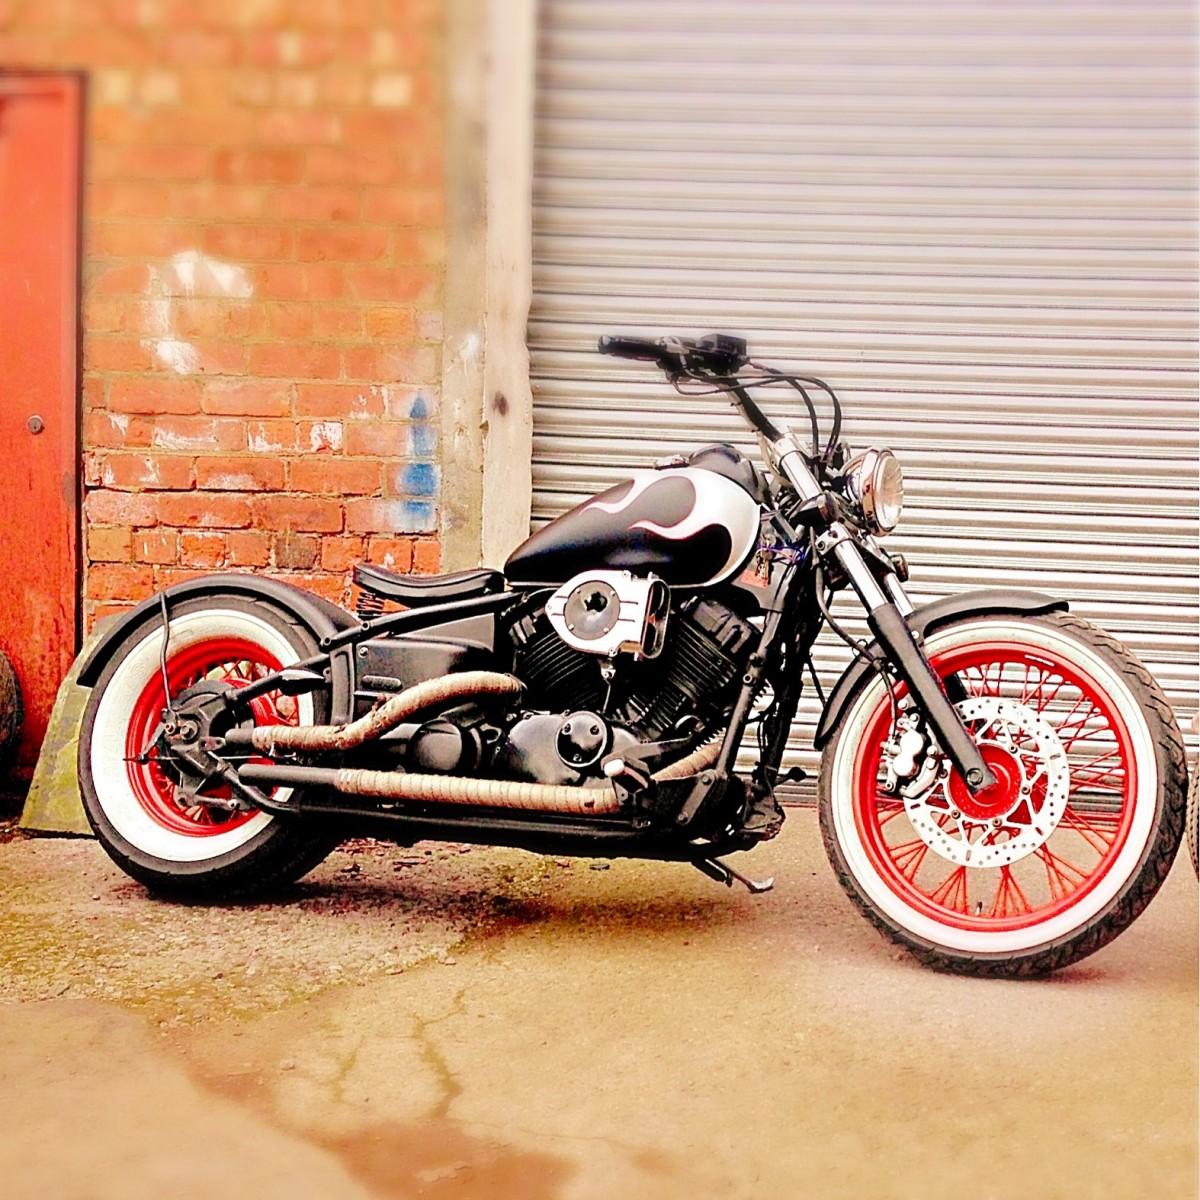 JM Customs - Bike